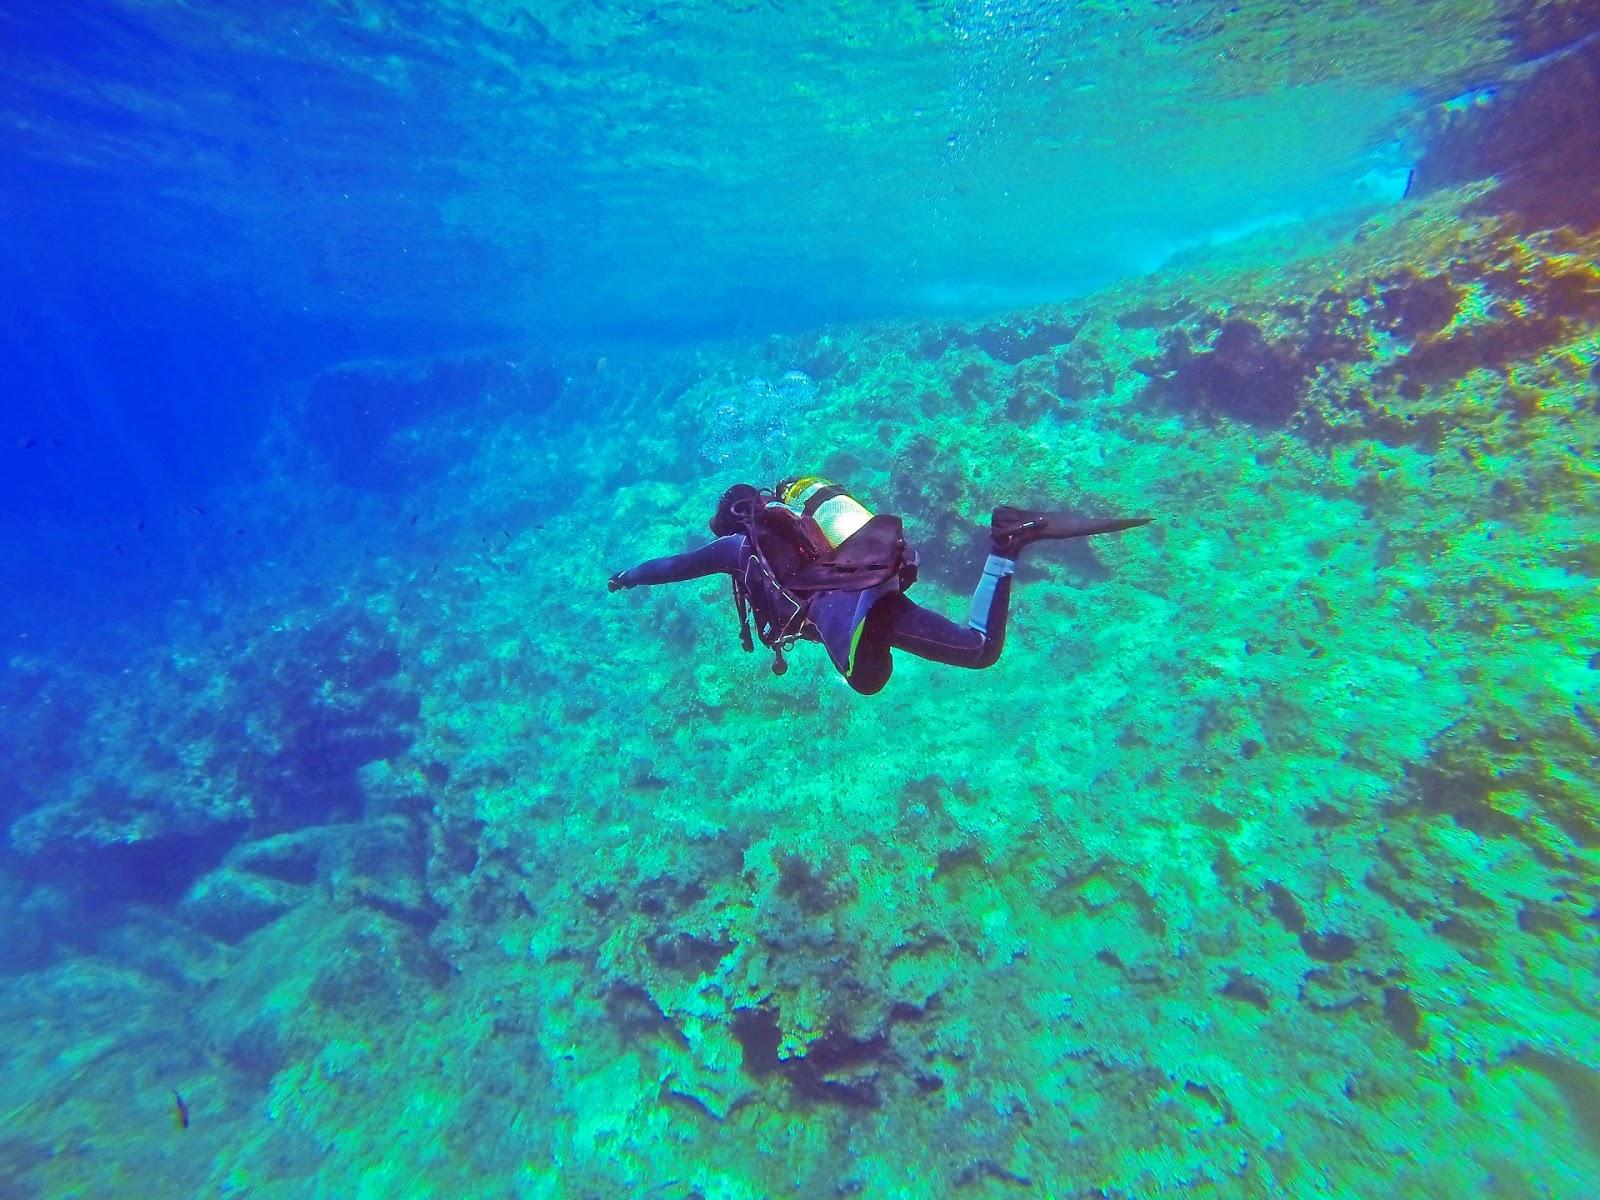 沖繩-潛水-浮潛-推薦-Okinawa-scuba-diving-snorkeling